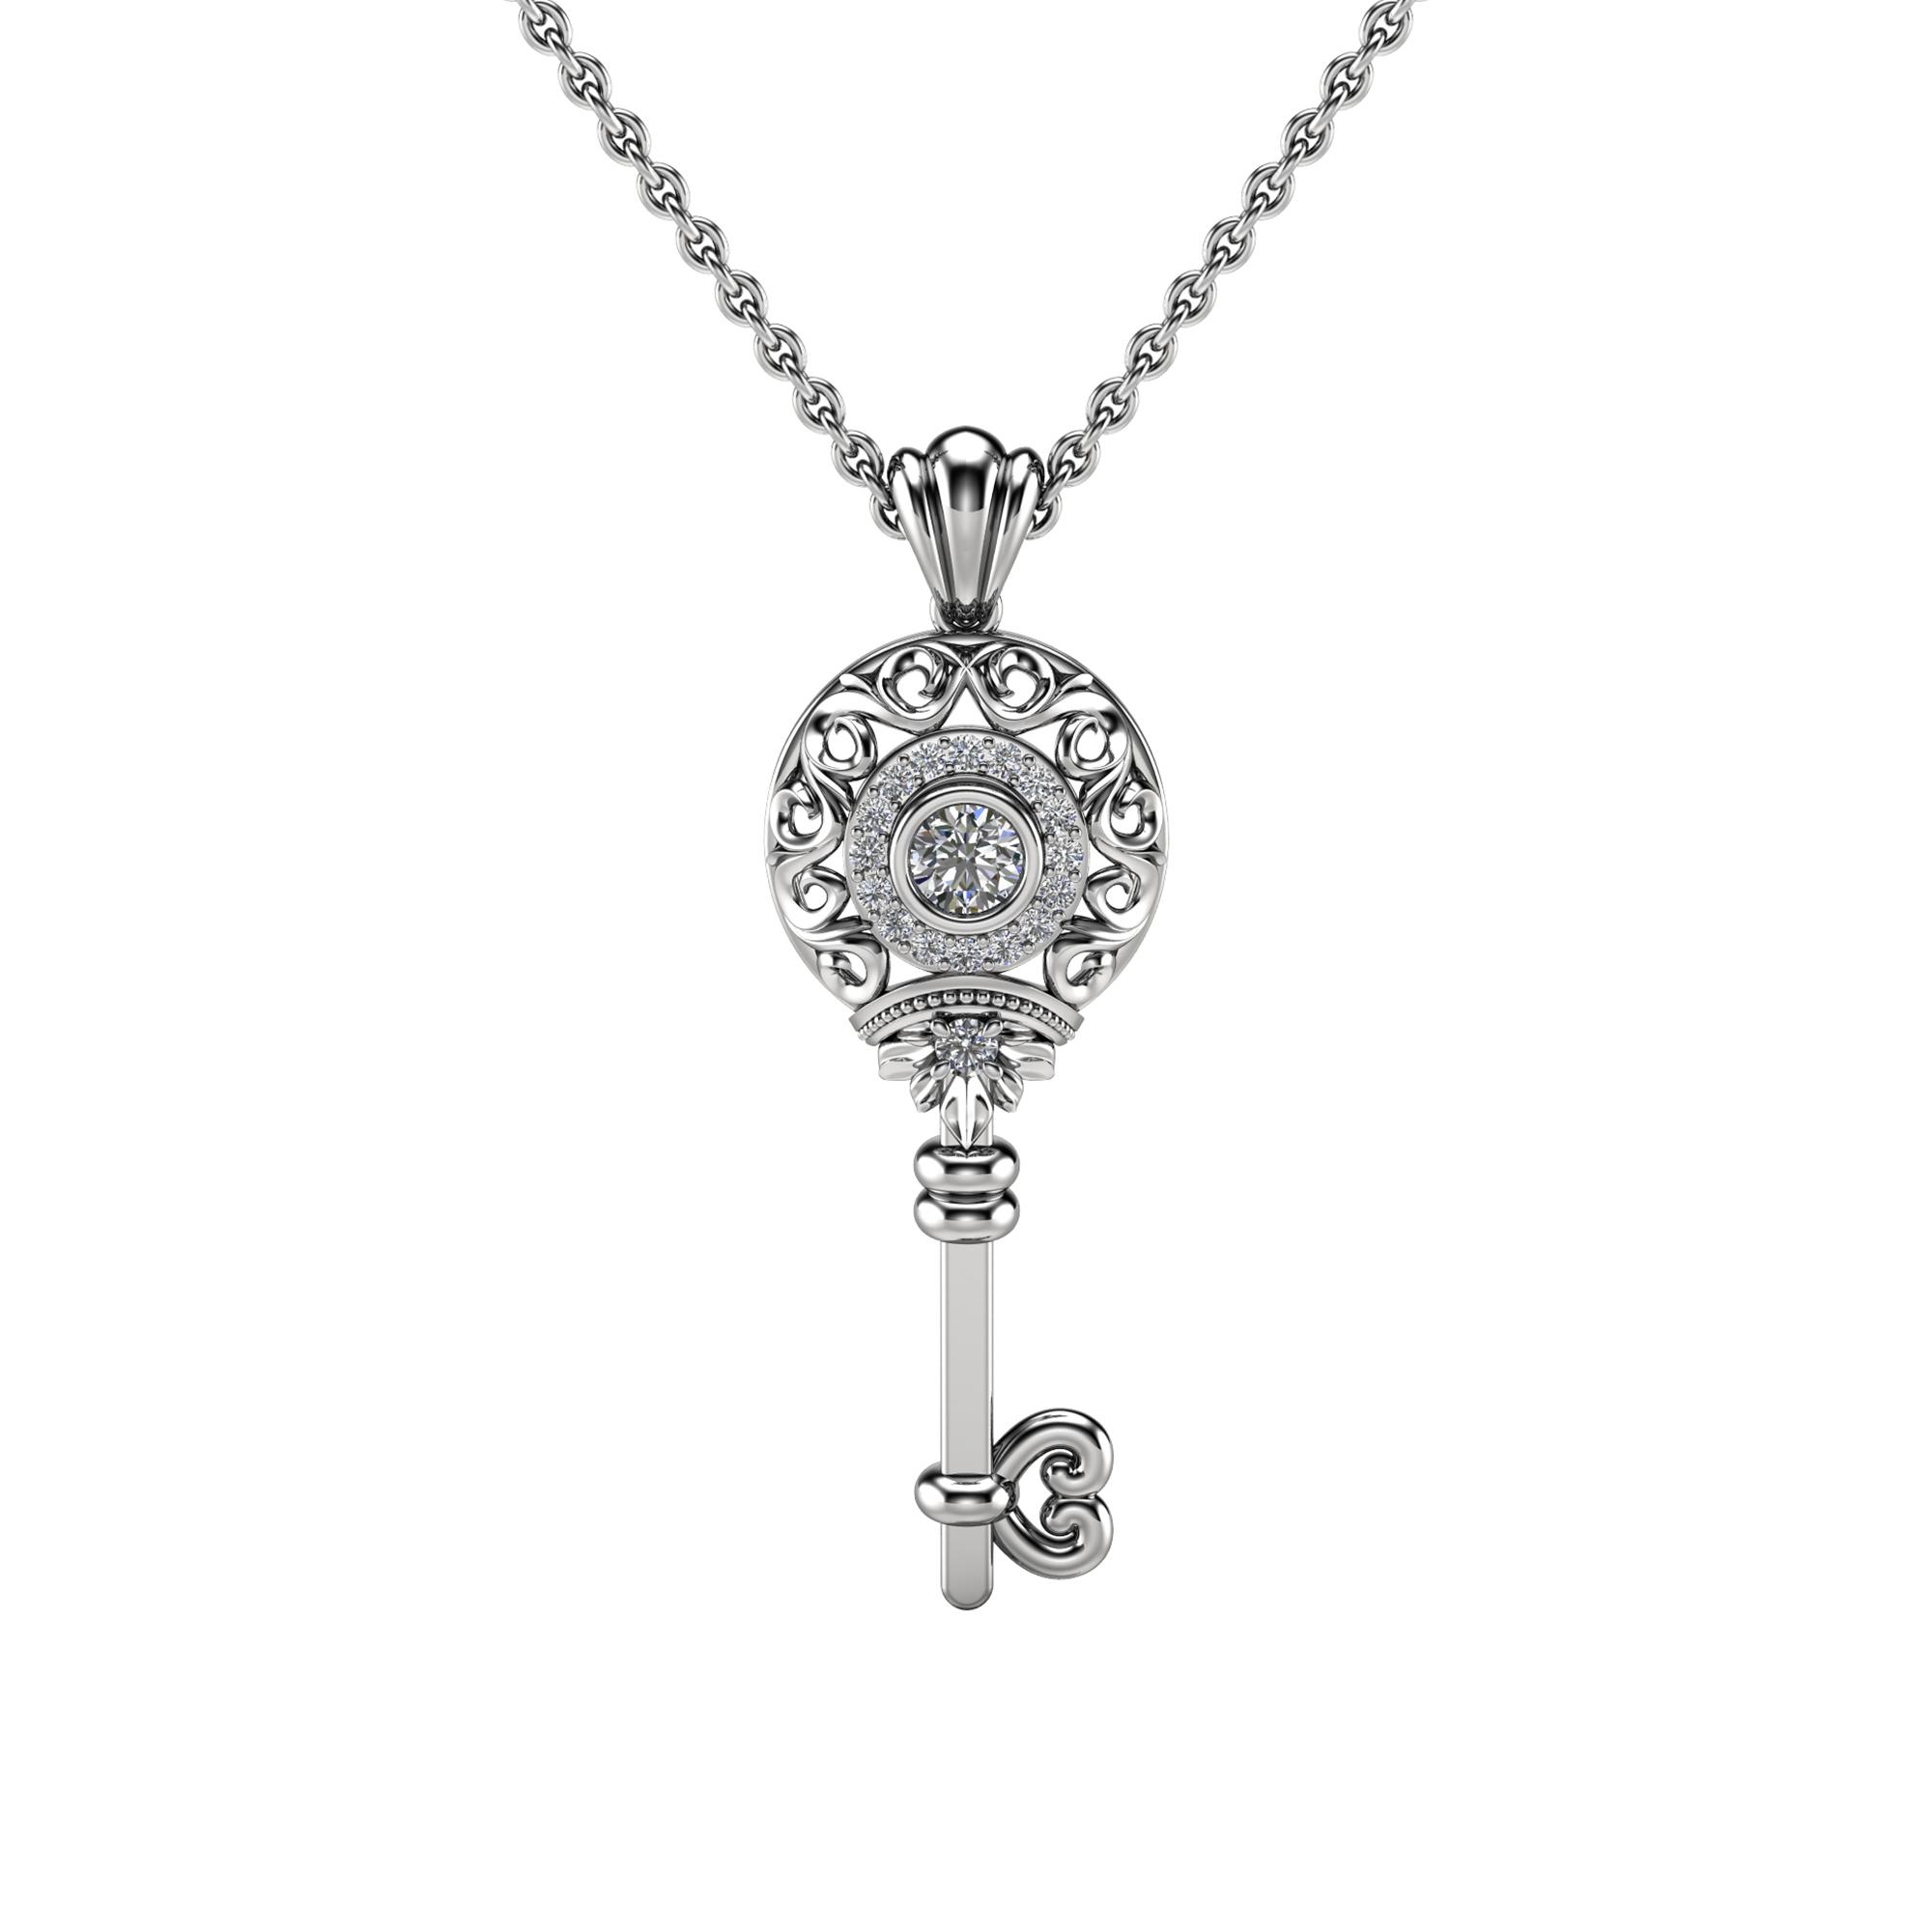 Gold Key Pendant Moissanite Pendant Edwardian 14K White Gold Diamonds Key Pendant Necklace